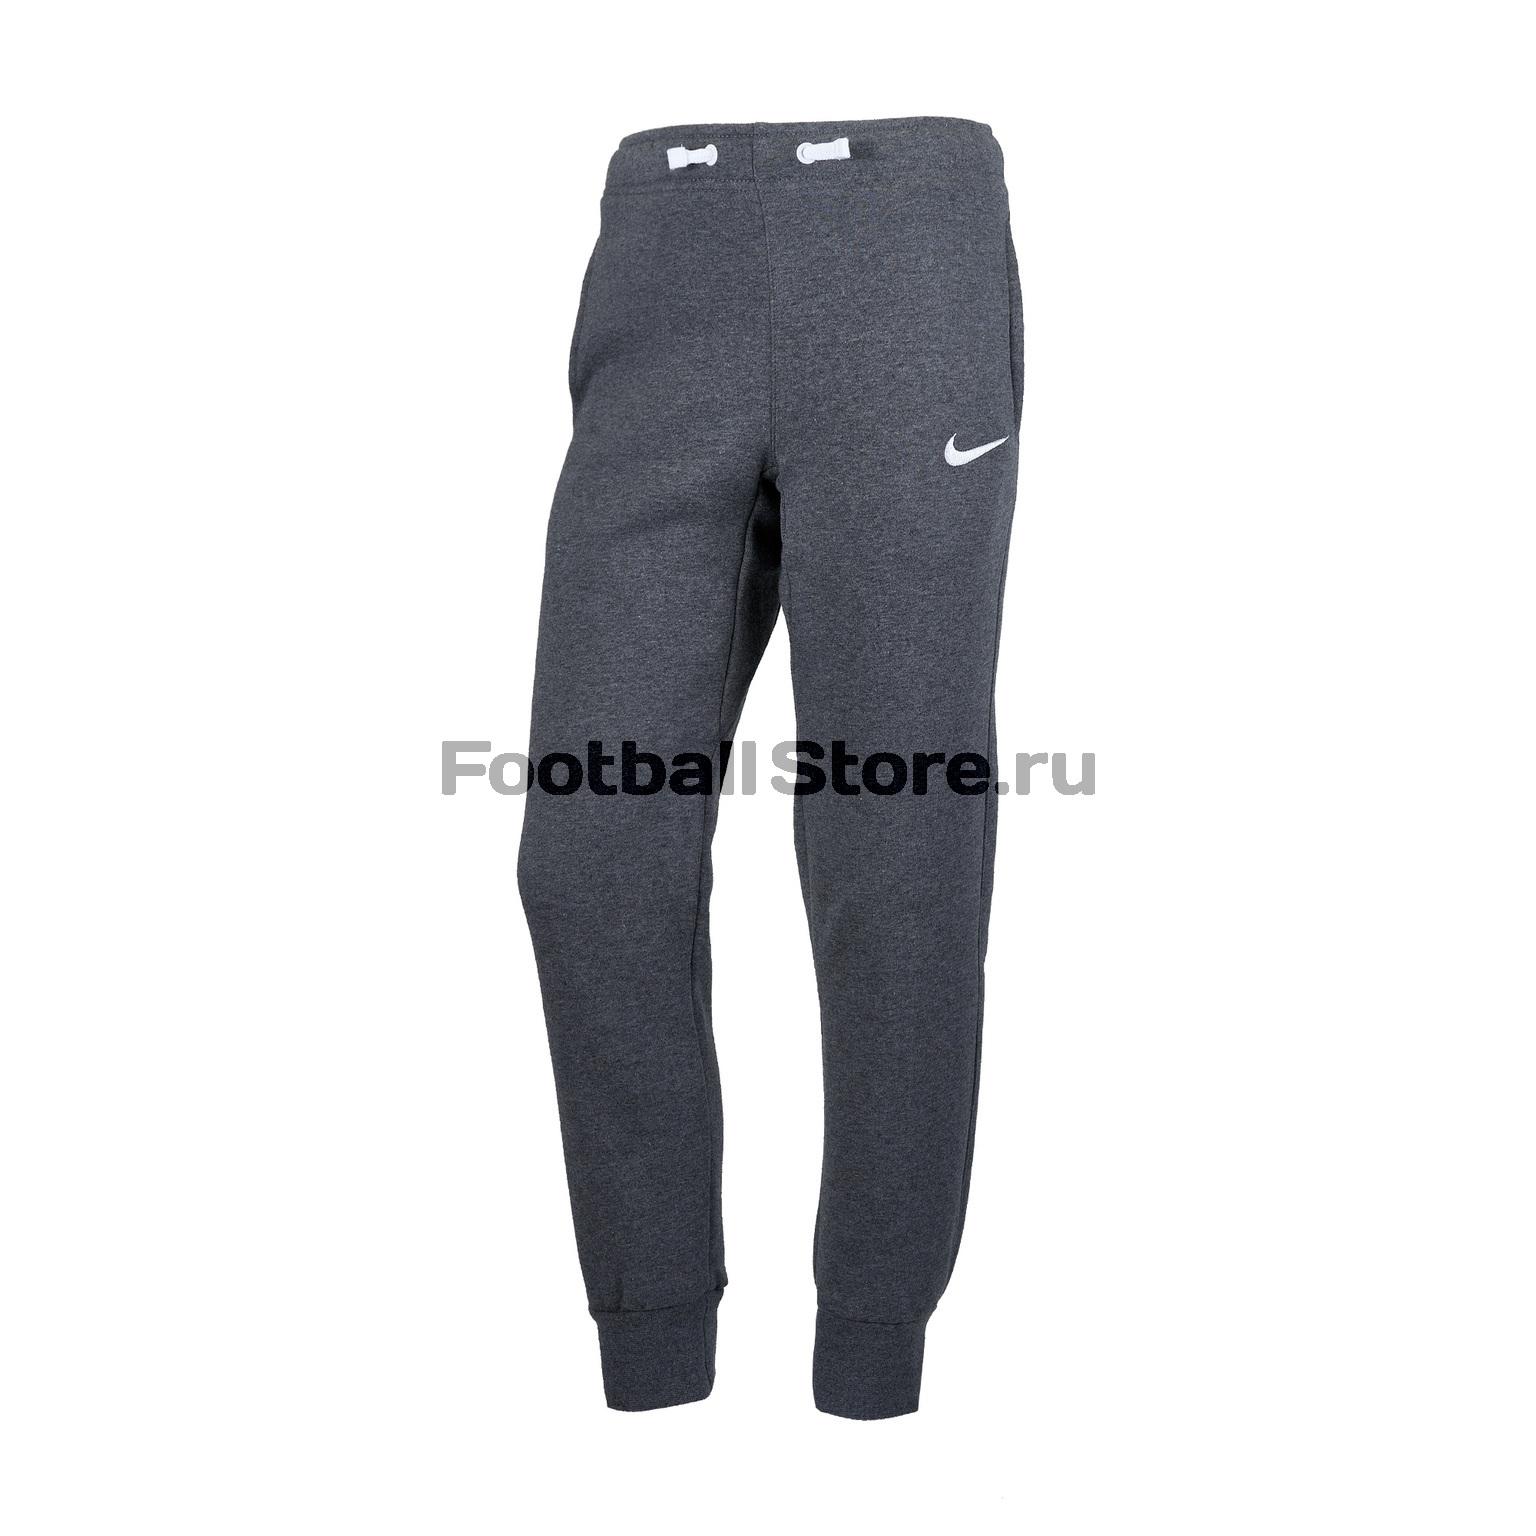 Брюки подростковые Nike Pant Club19 AJ1549-071 брюки подростковые вратарские umbro gk padded pant 64596u